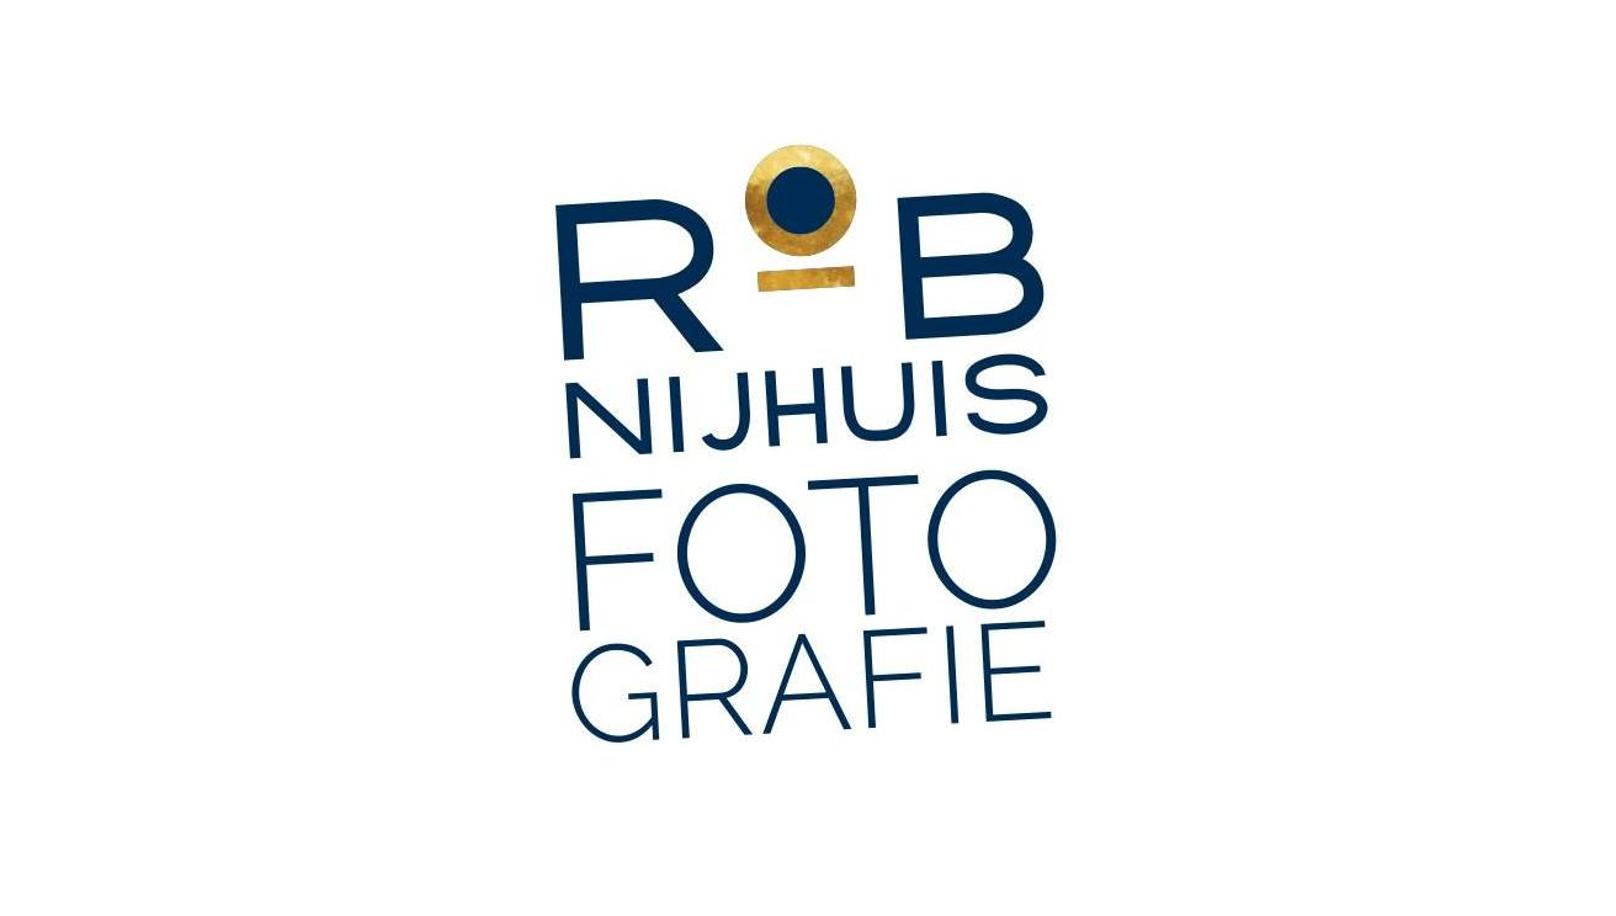 Rob Nijhuis Fotografie